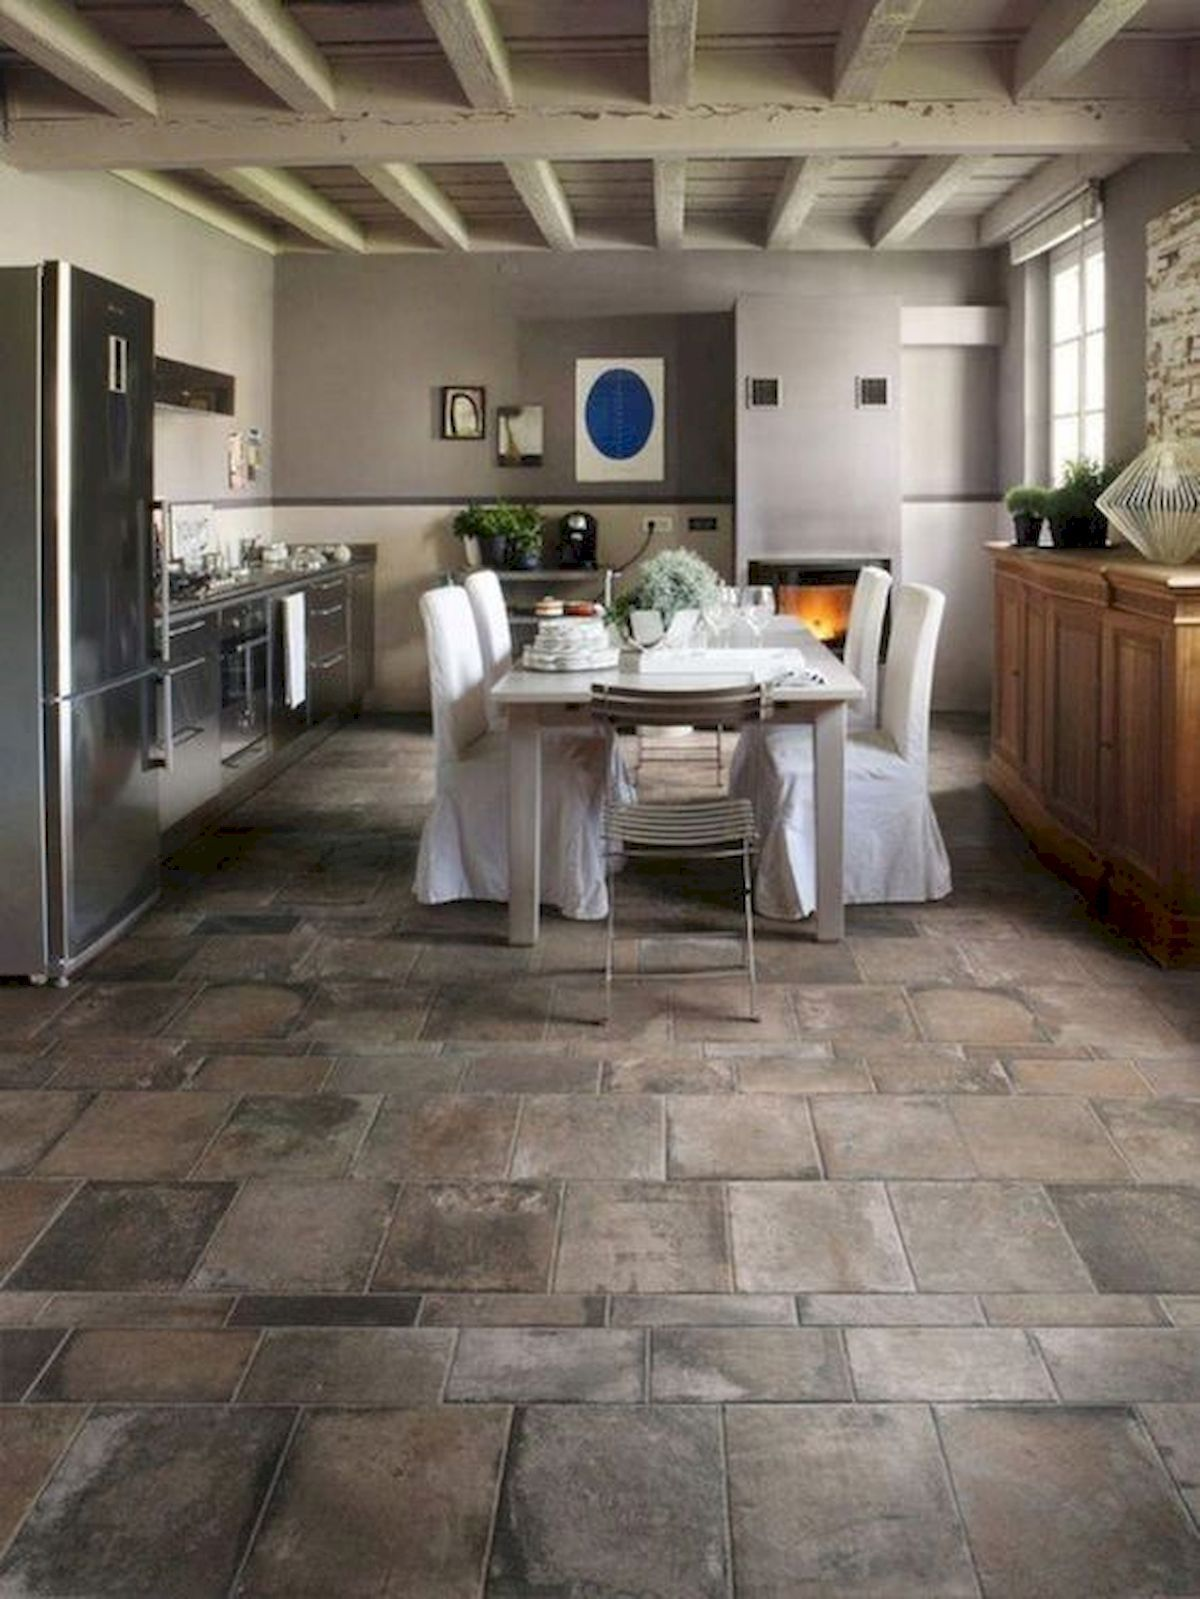 30 Best Kitchen Floor Tile Design Ideas With Concrete Floor Ideas Kitchen Flooring Grey Kitchen Floor Kitchen Floor Tile